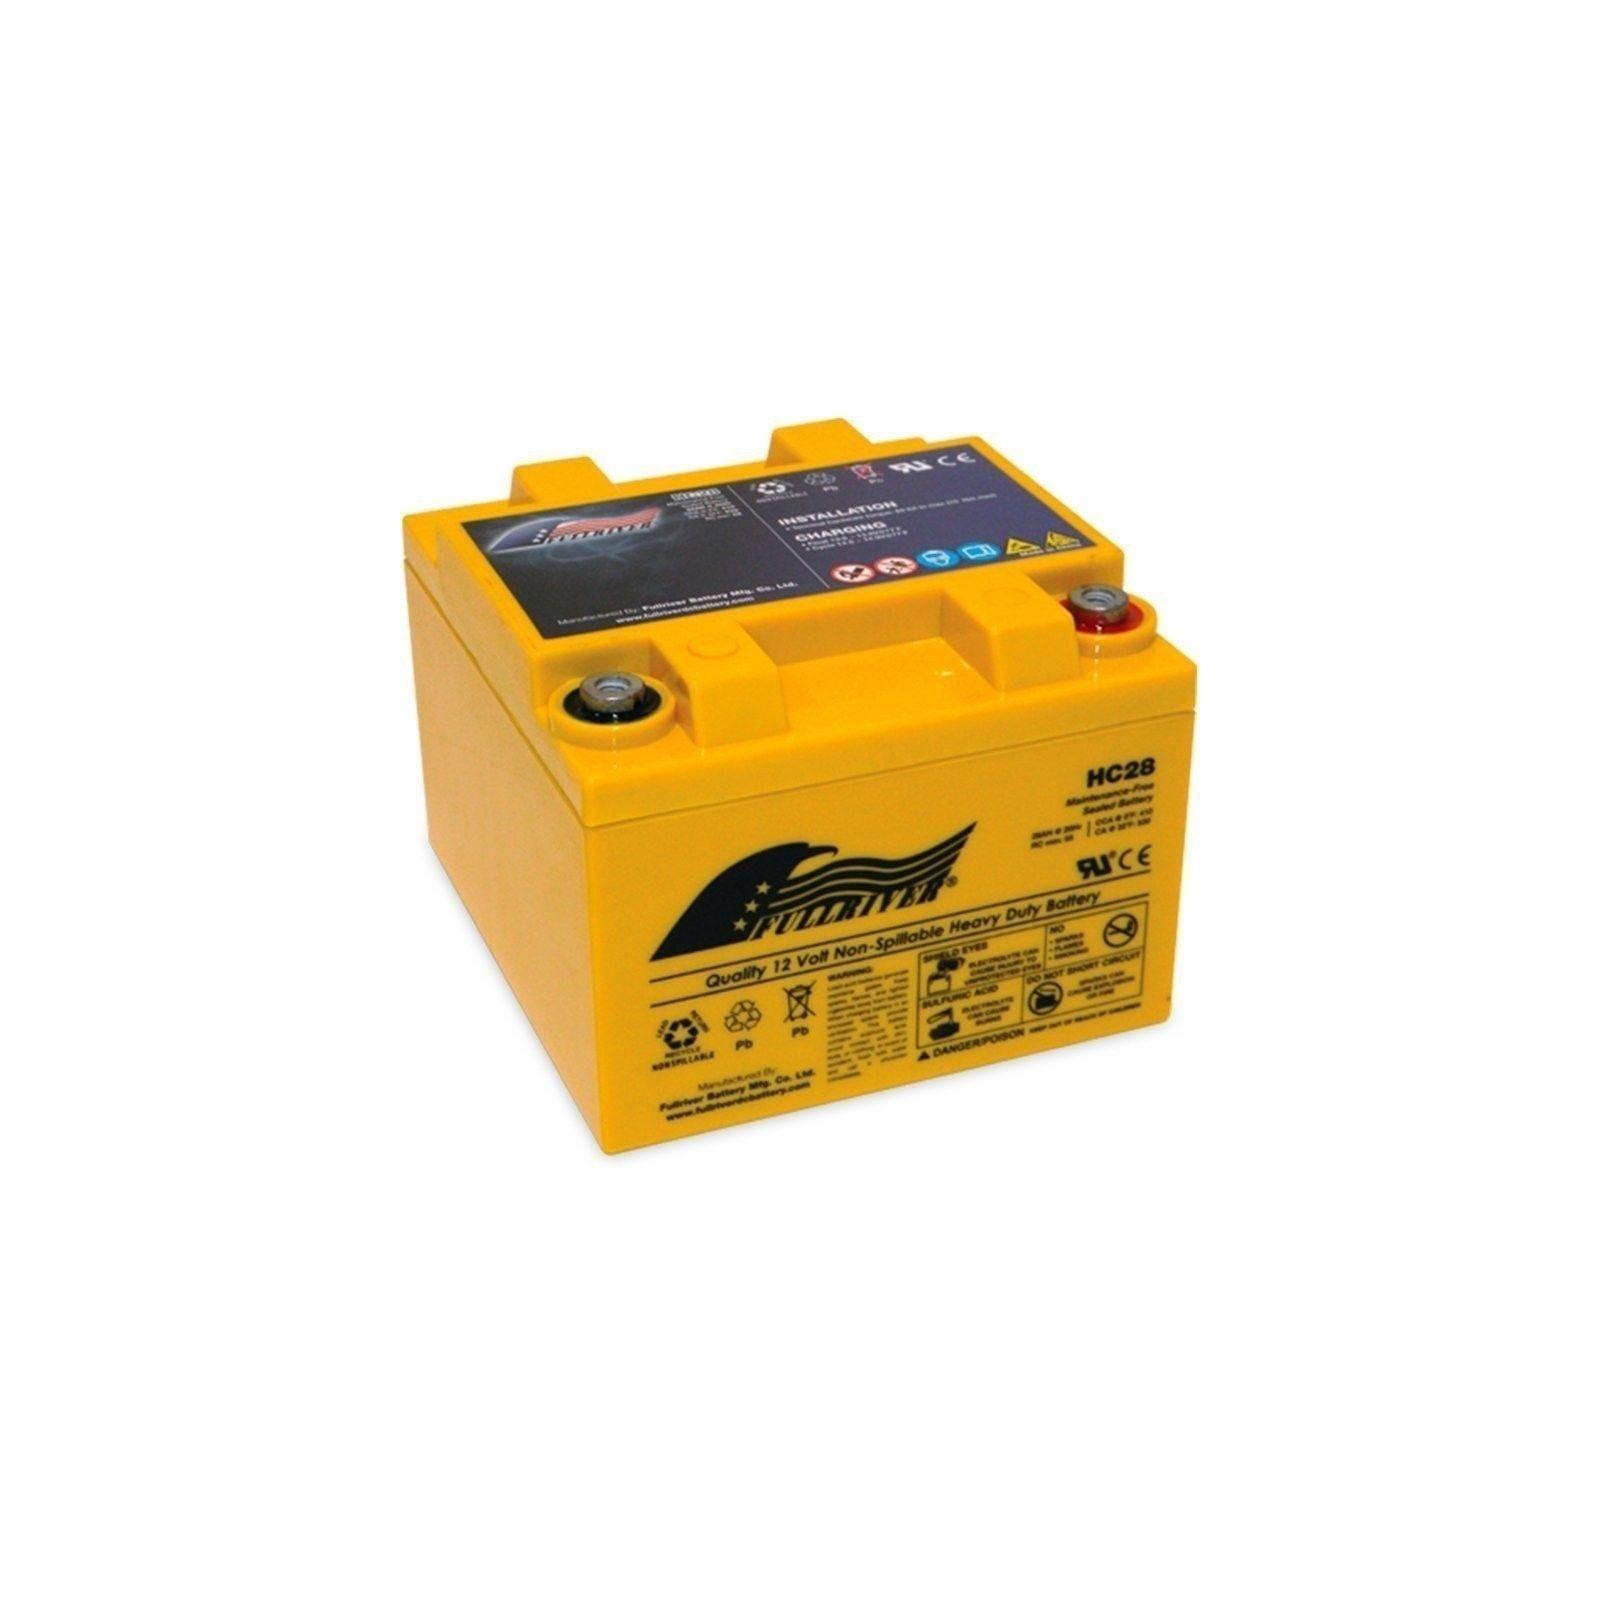 Battery Fullriver HC28 28Ah 410A 12V Hc FULLRIVER - 1